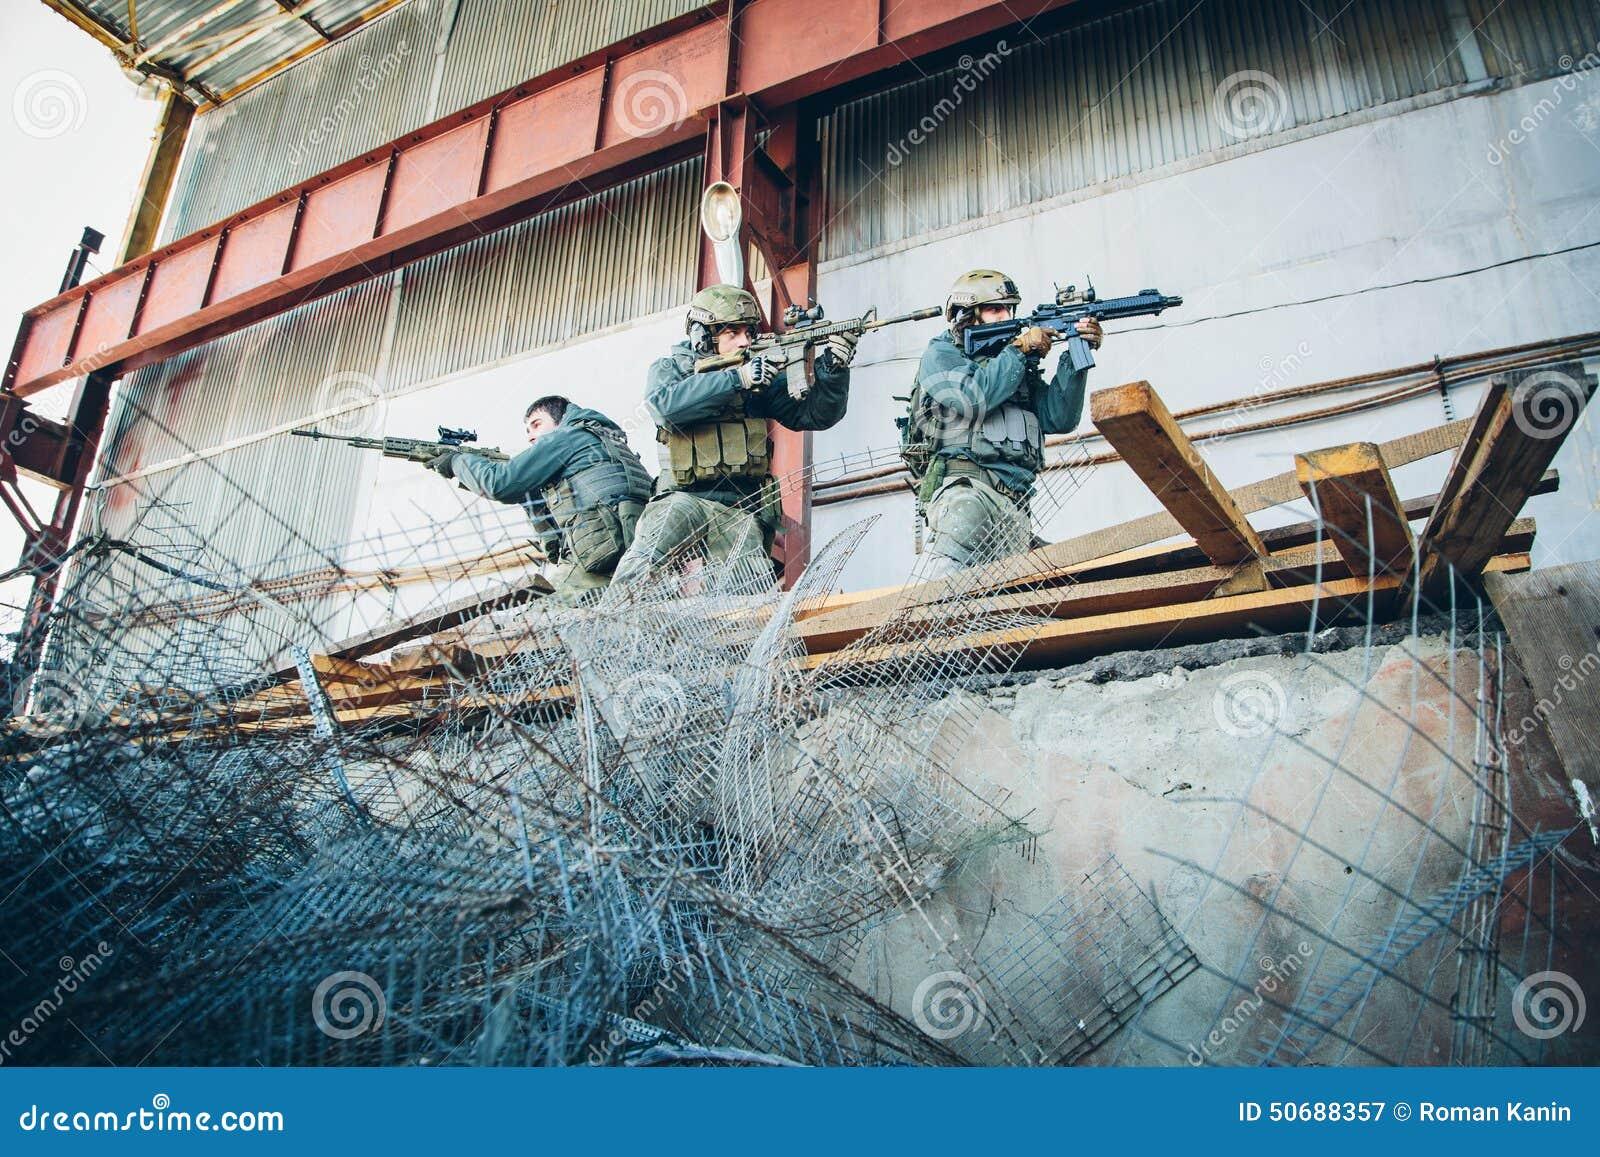 Download 三位战士从敌人释放了大厦 库存图片. 图片 包括有 目标, 出现, 英雄, 友善, 危险, 控制, 阵营 - 50688357